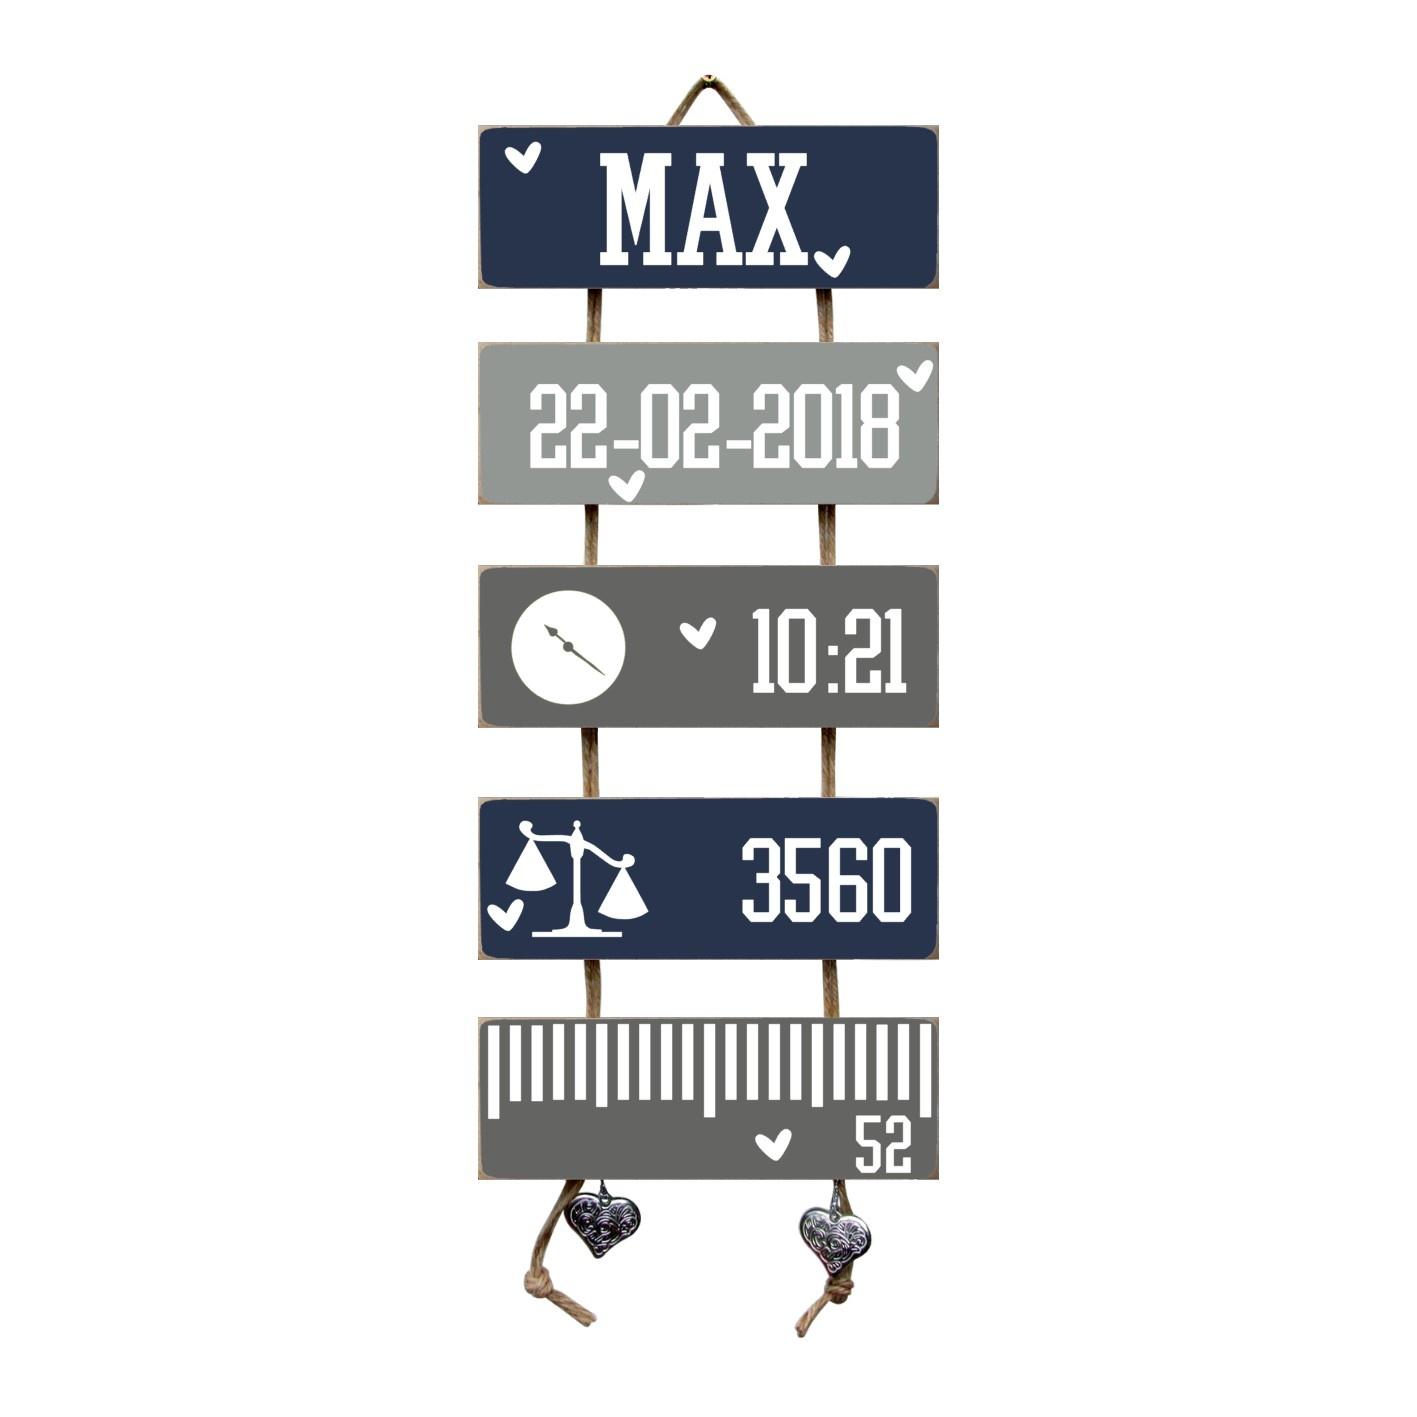 Kraamcadeau Geboorteladder Max donkerblauw/grijs